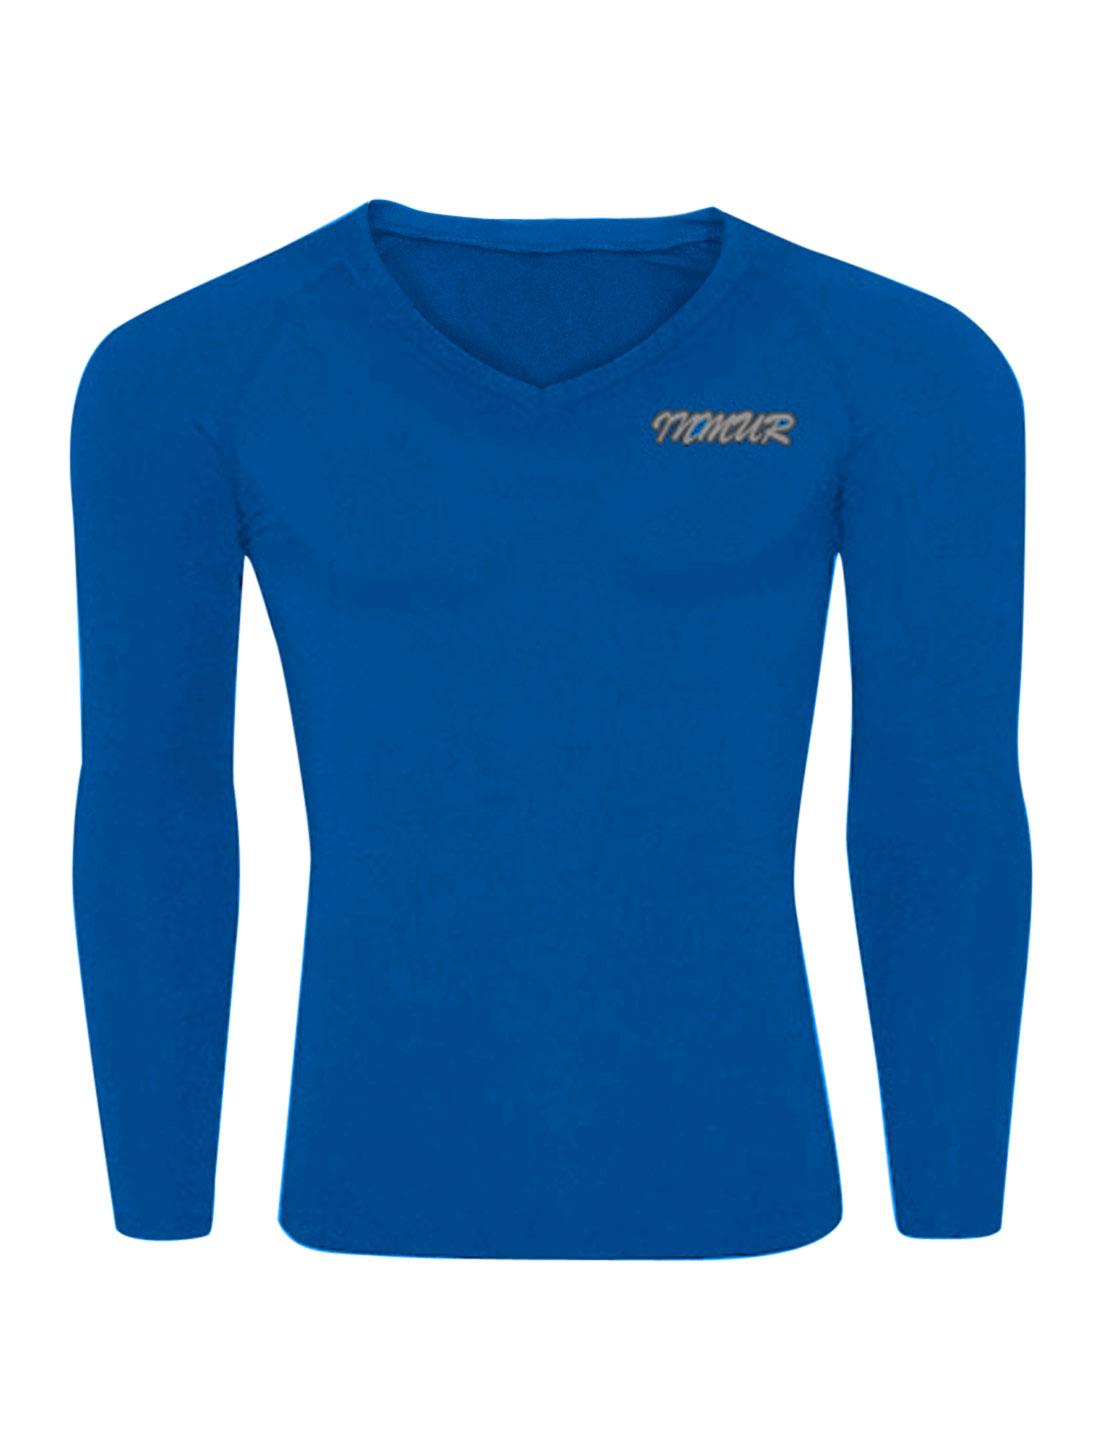 Men V Neck Letters Detail Slipover Skintight Sports T-shirt Sea Blue M